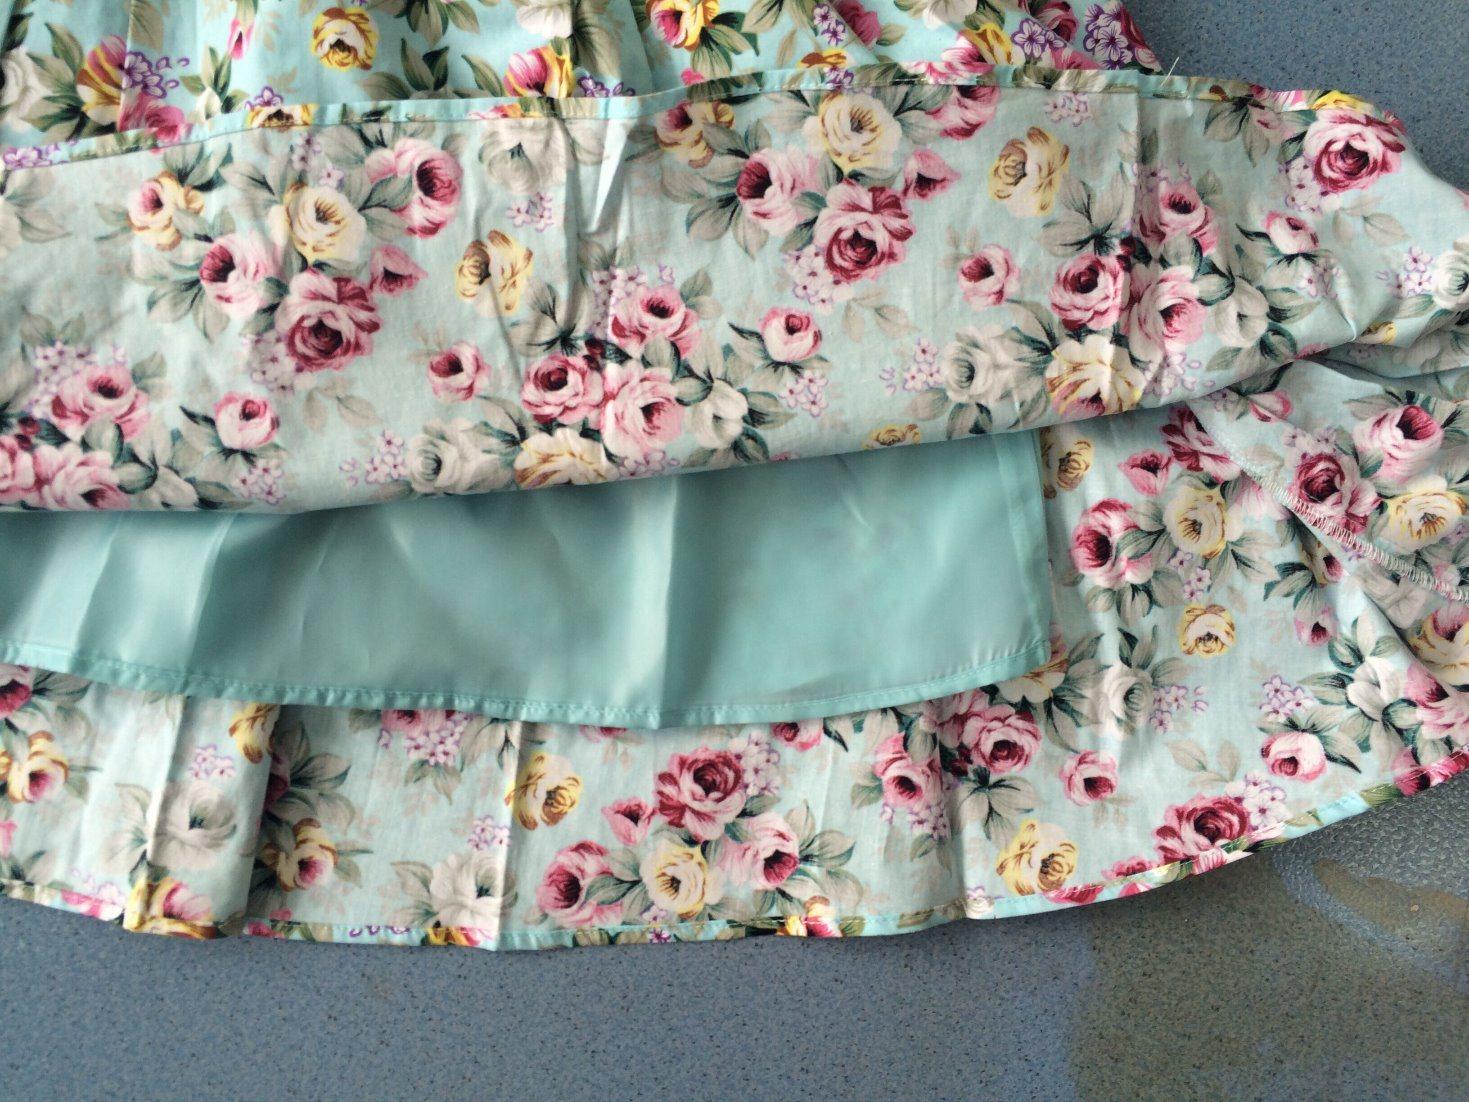 2017 Plus Size Women Clothing Summer Evening Party Dress Sleeveless